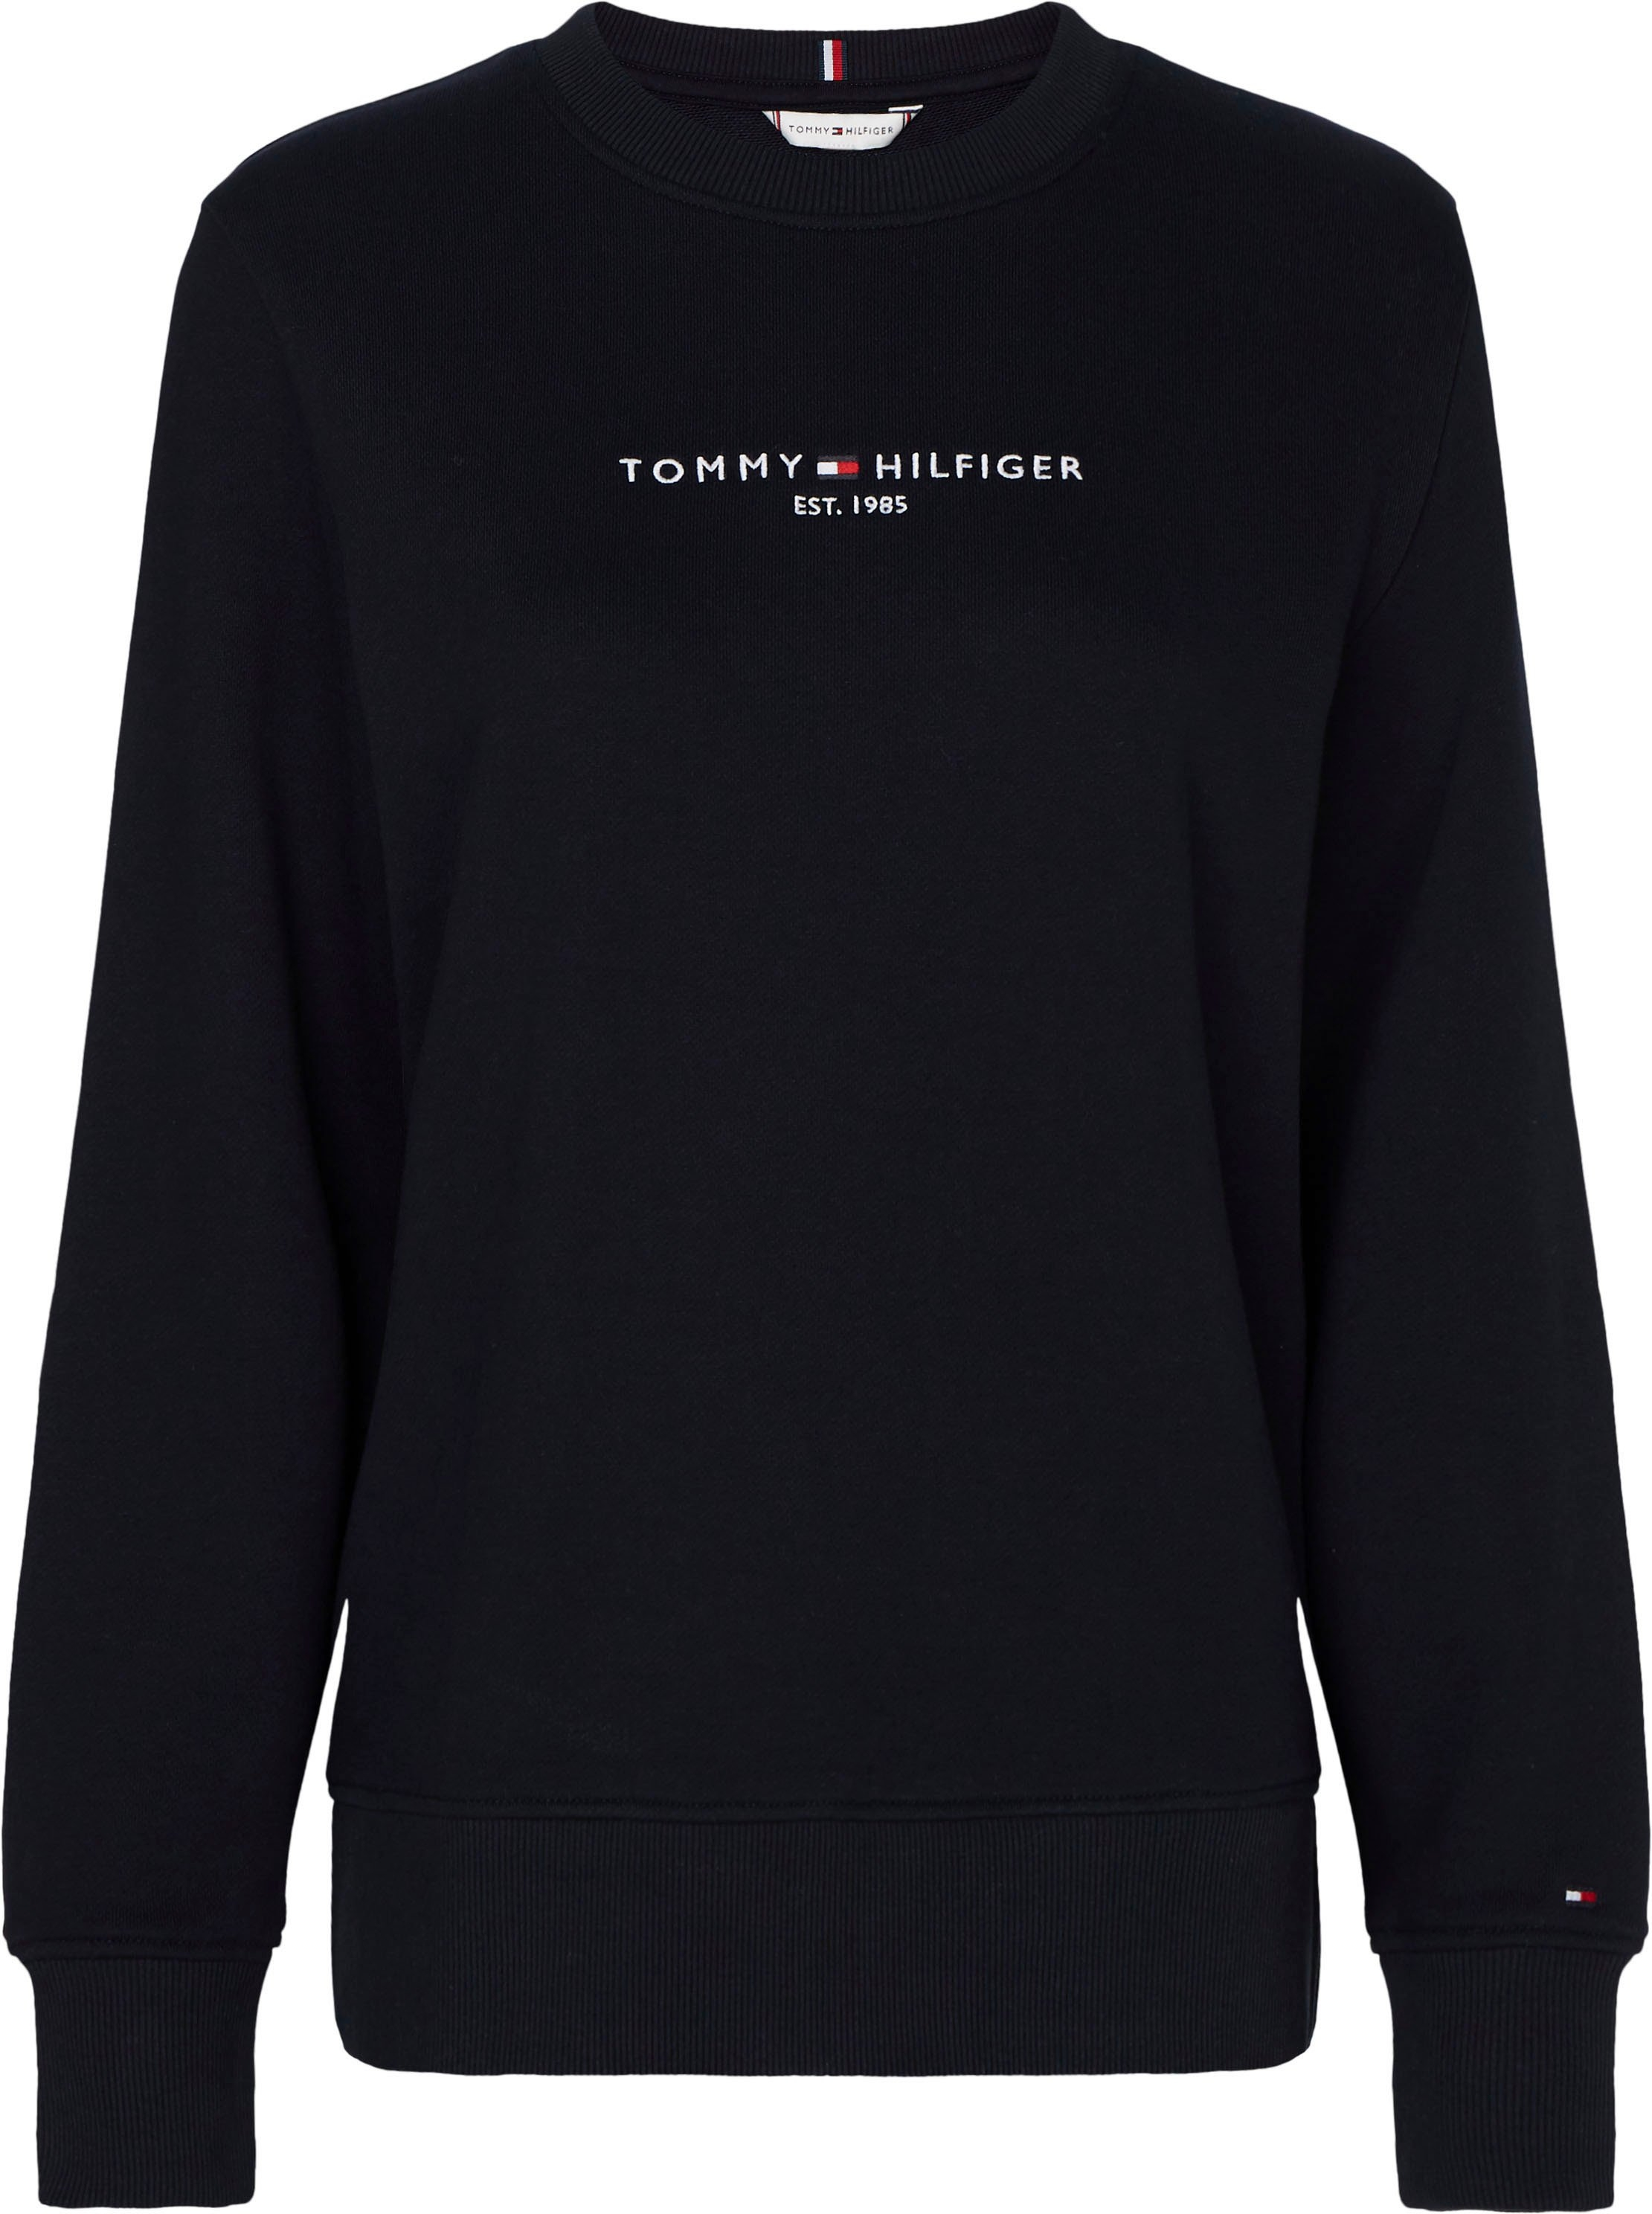 Tommy Hilfiger Sweatshirt TH ESS HILFIGER C-NK SWEATSHIRT met geborduurd lineair tommy hilfiger-logo-opschrift & flag bestellen: 30 dagen bedenktijd